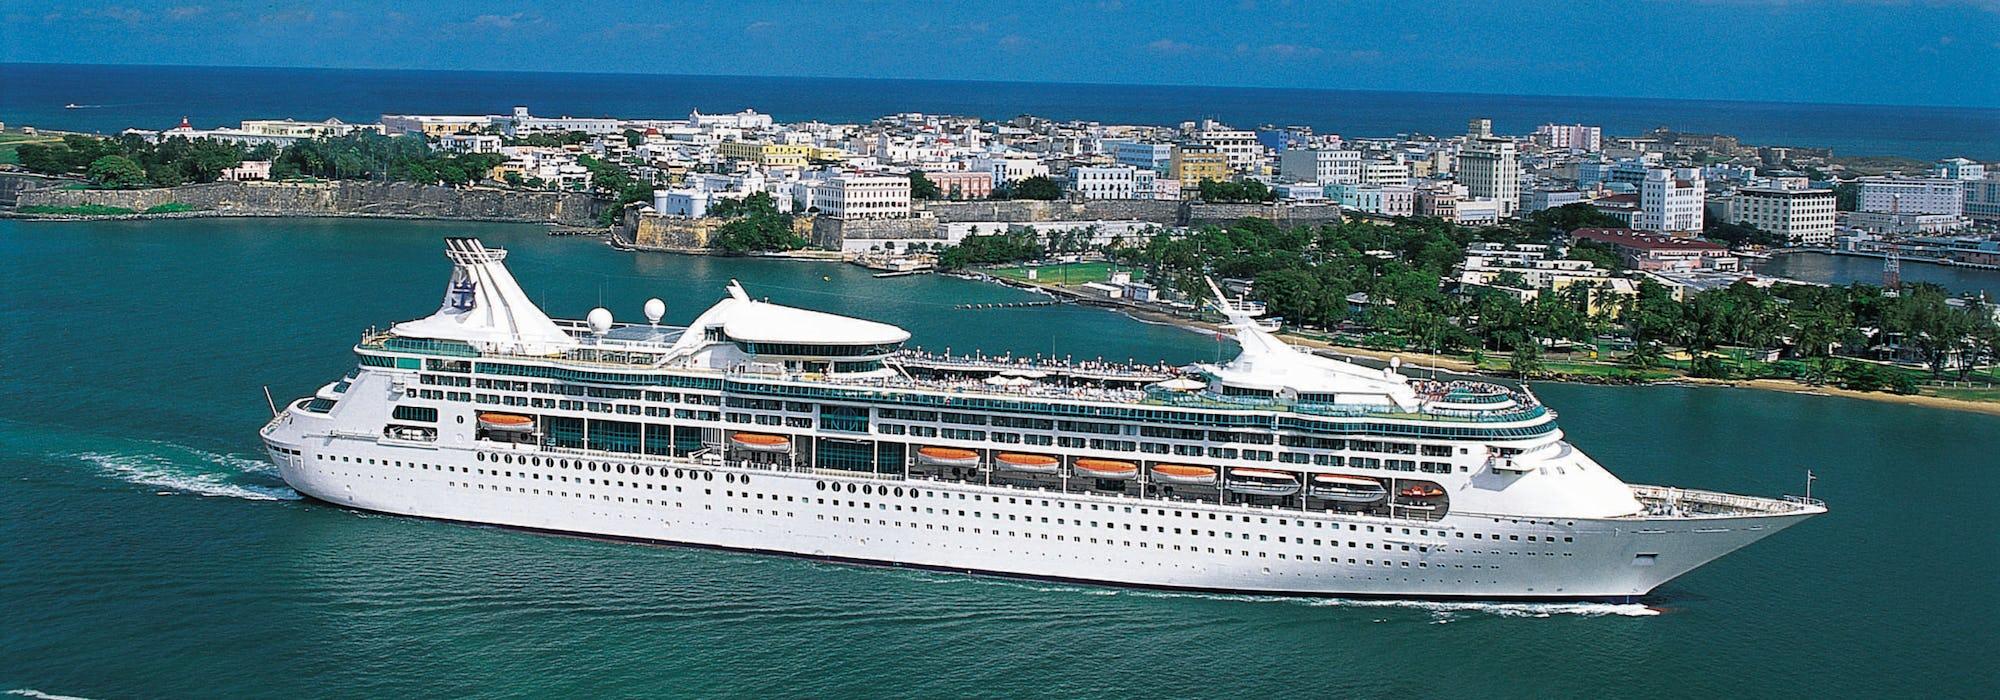 Fartyget Enchantment of the Seas kryssar förbi en mindre ö.